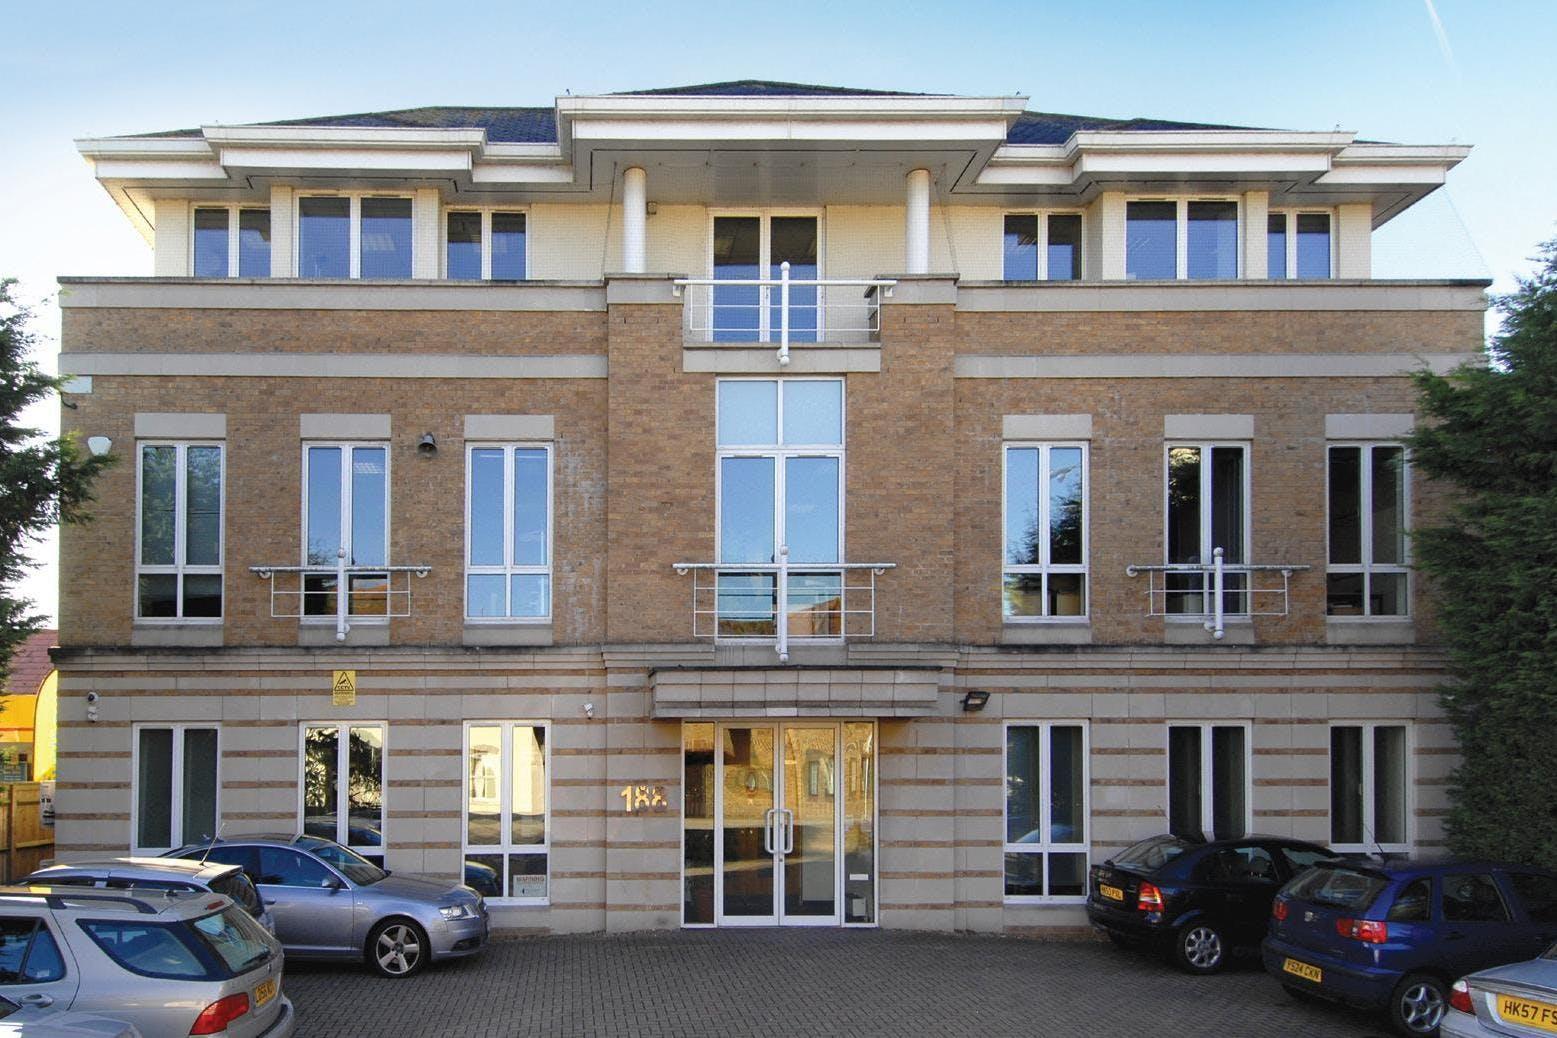 188 High Street, Egham, Office To Let - 188 High Street Egham front elevation.jpg